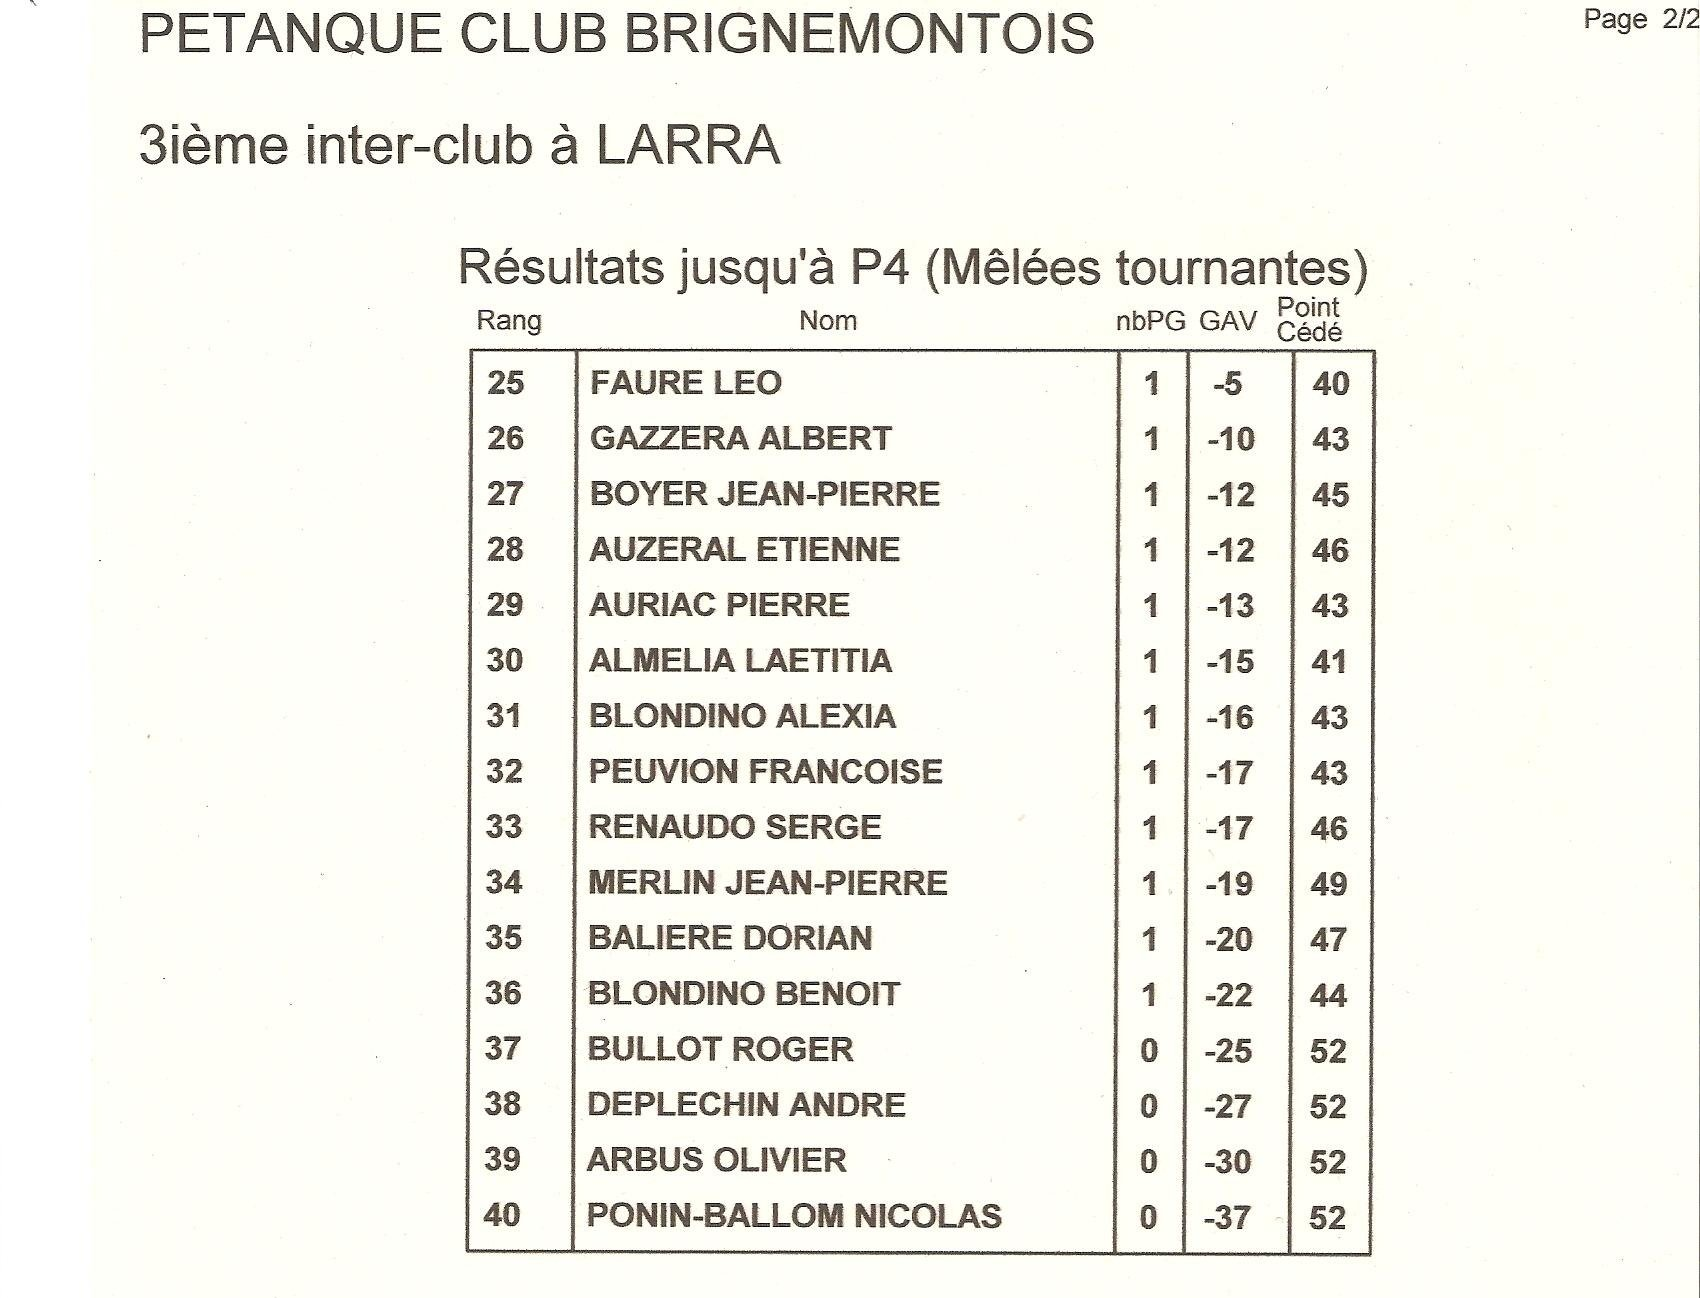 interclub2001larrasuite001 dans INTER-CLUBS 2011 (BRIGNEMONT-COX-LARRA)